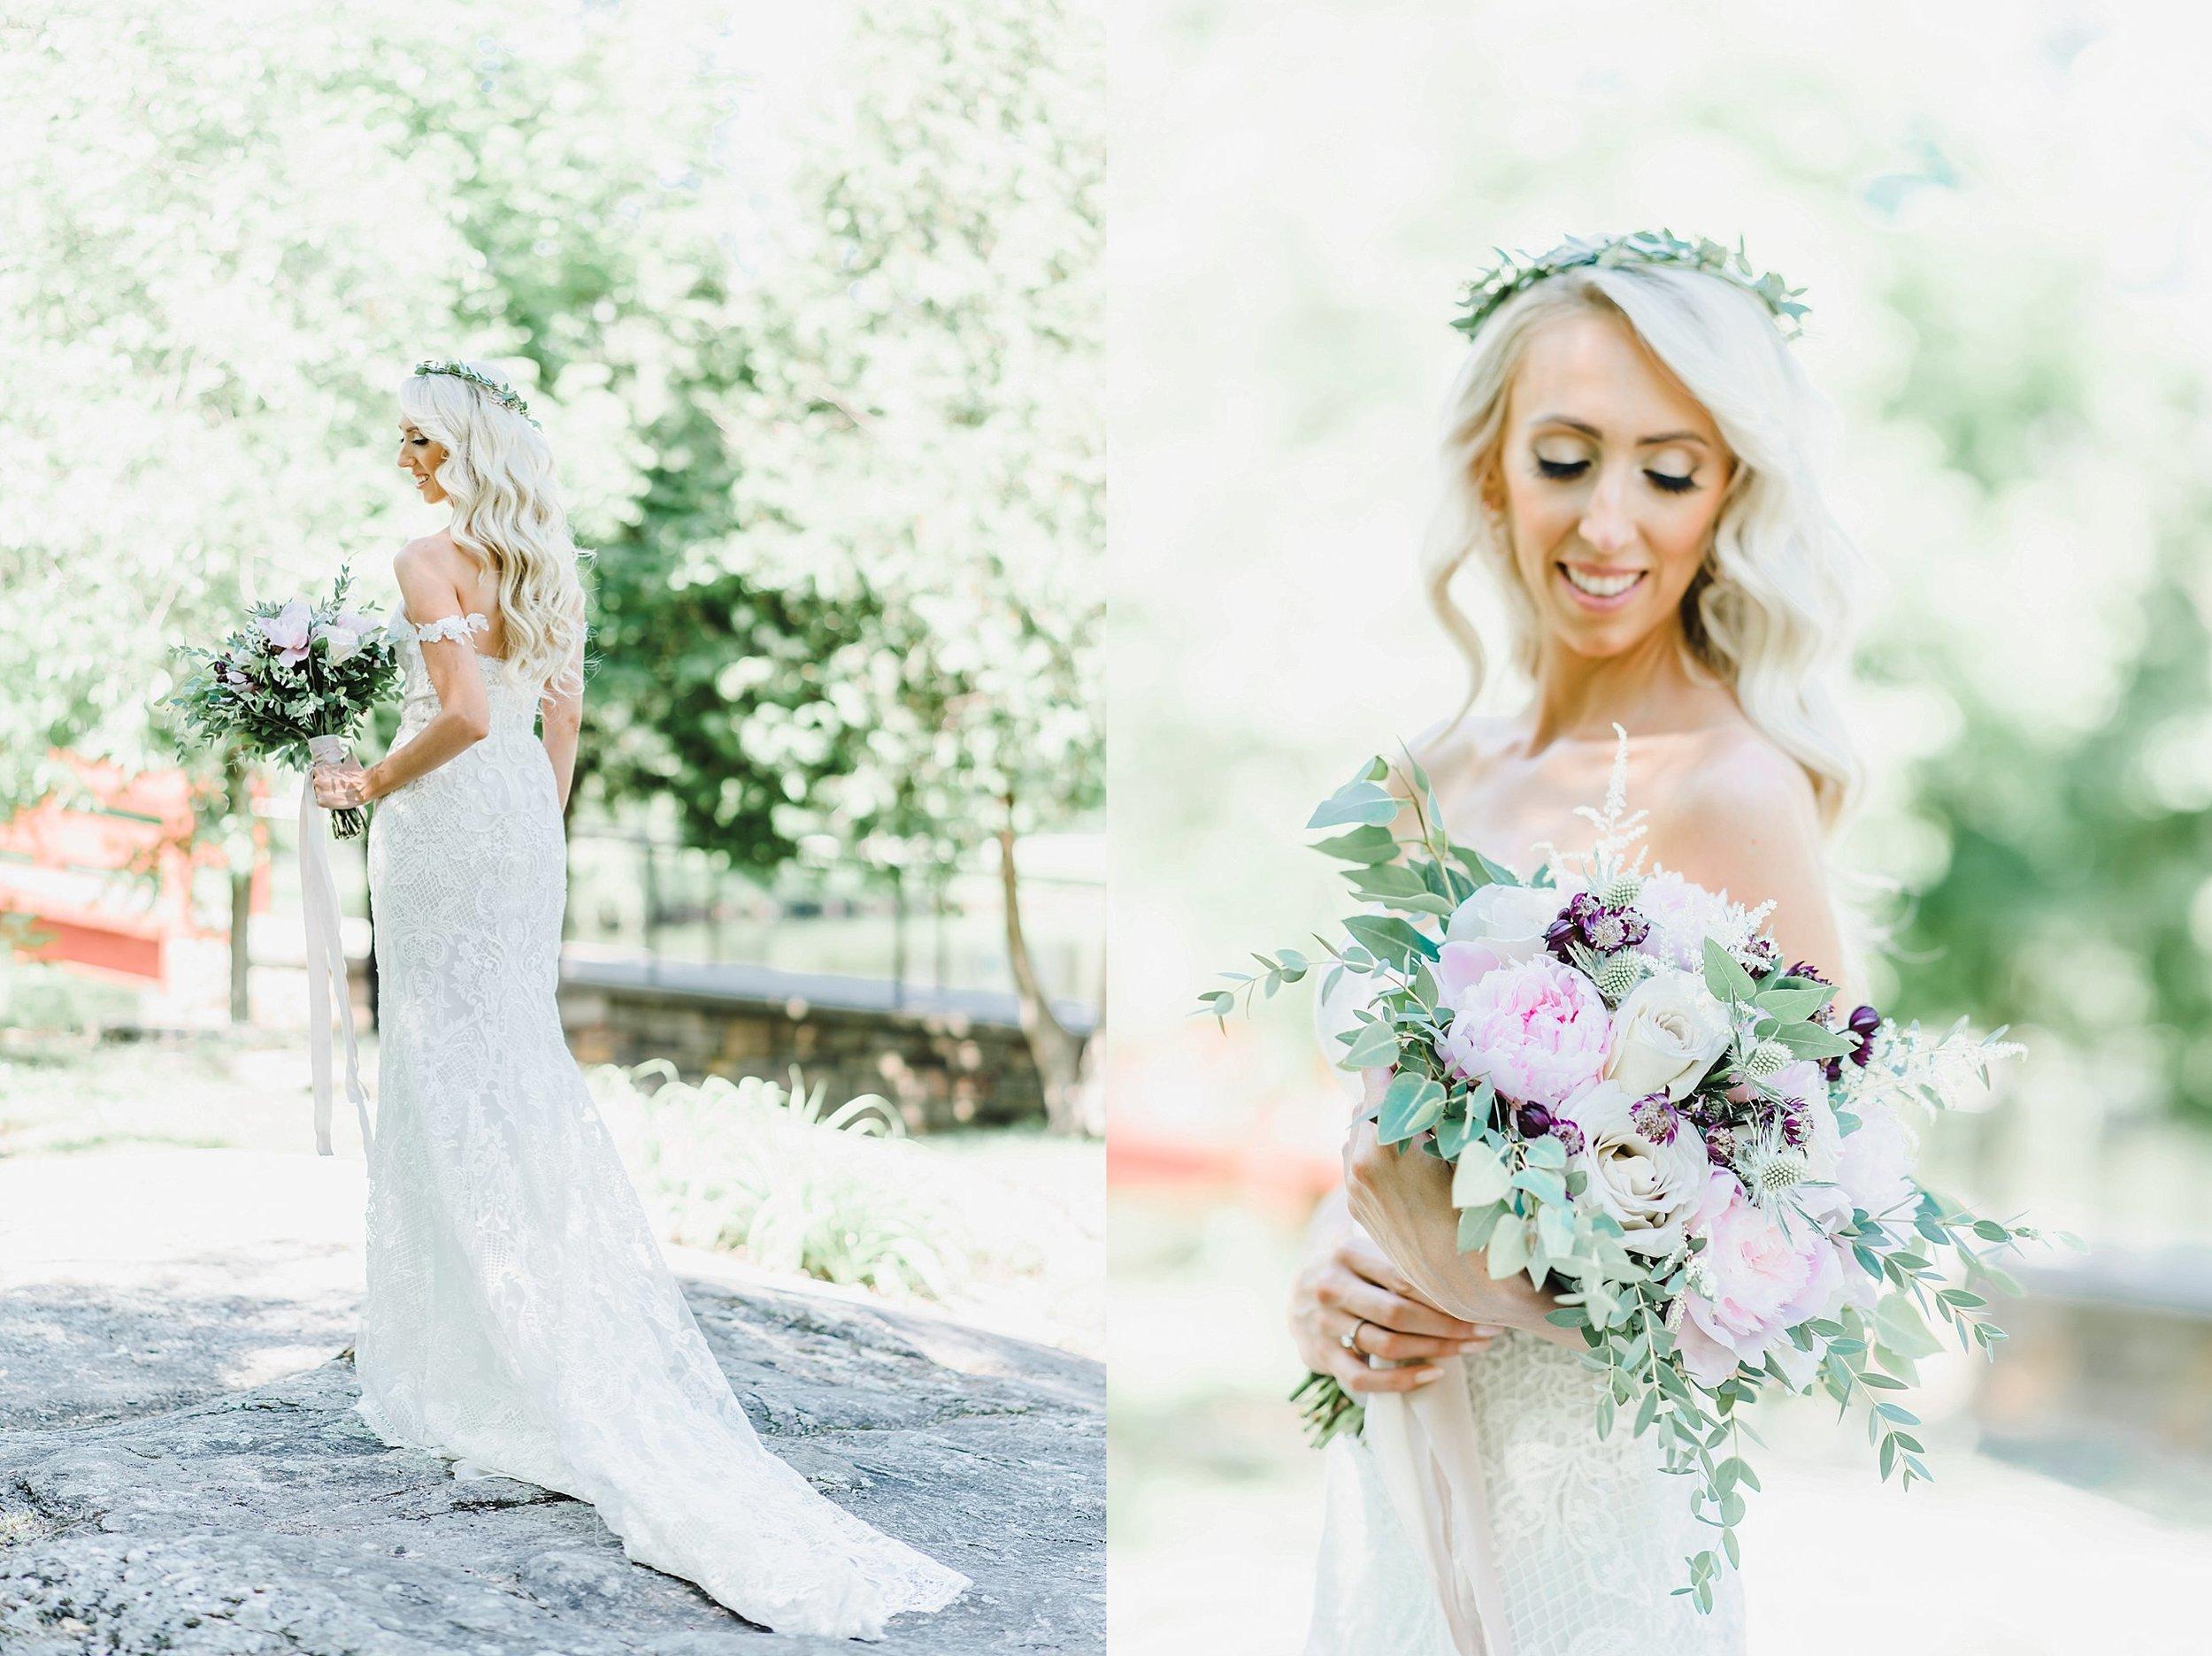 light airy indie fine art ottawa wedding photographer | Ali and Batoul Photography_0047.jpg